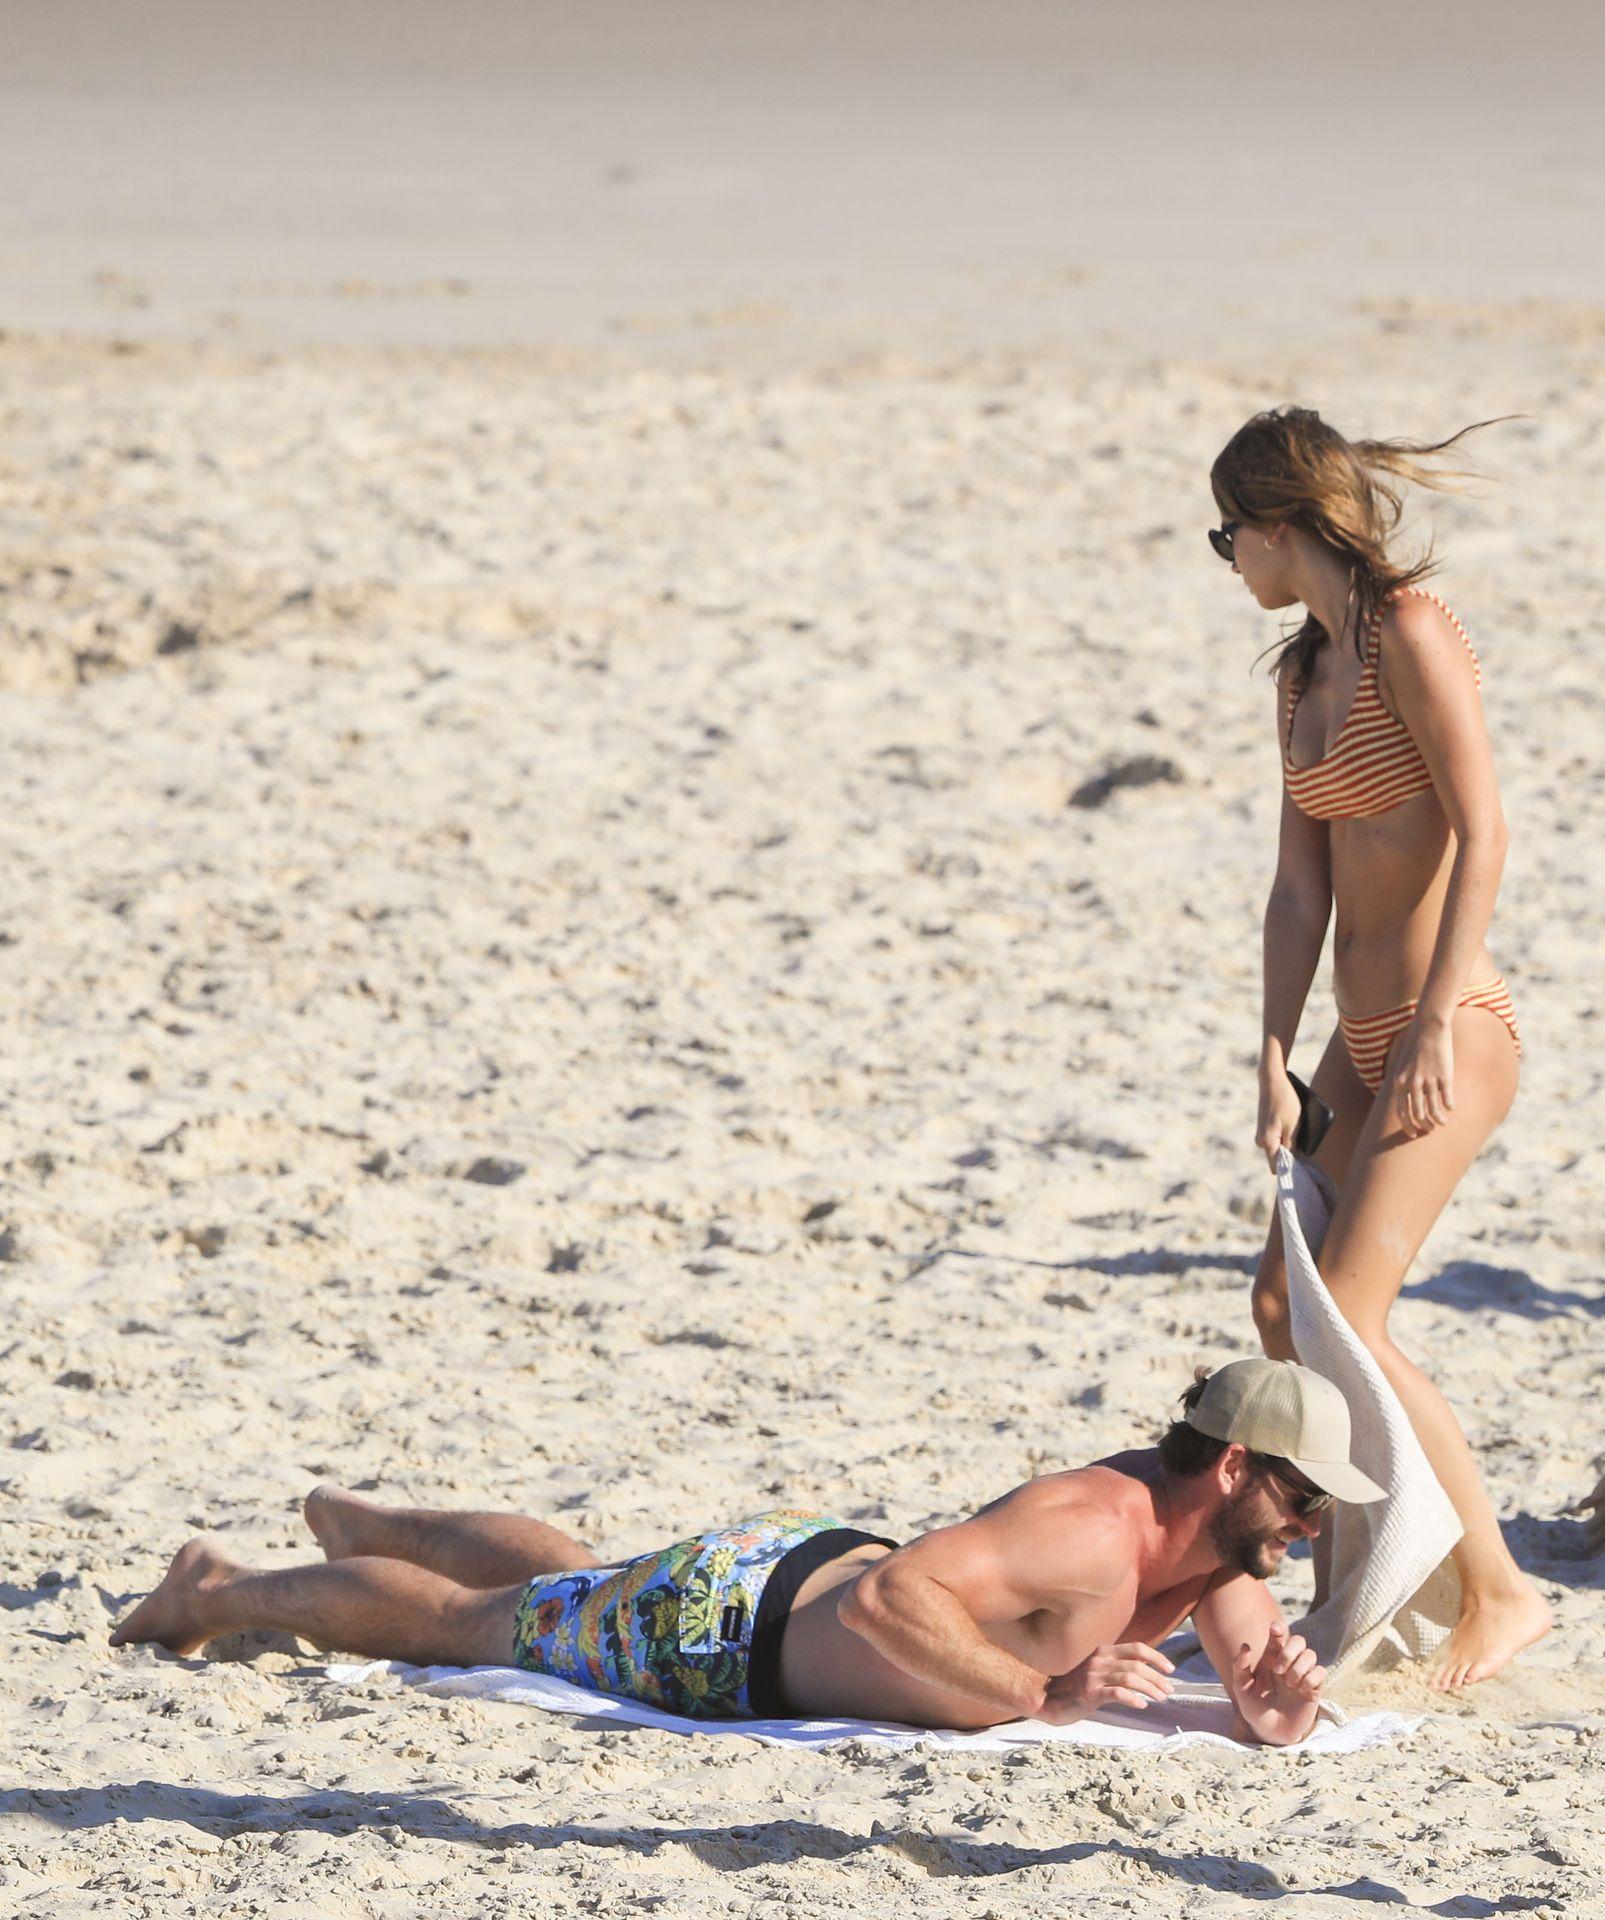 Gabriella Brooks Hot – Liam Hemsworth's New Girlfriend 0049